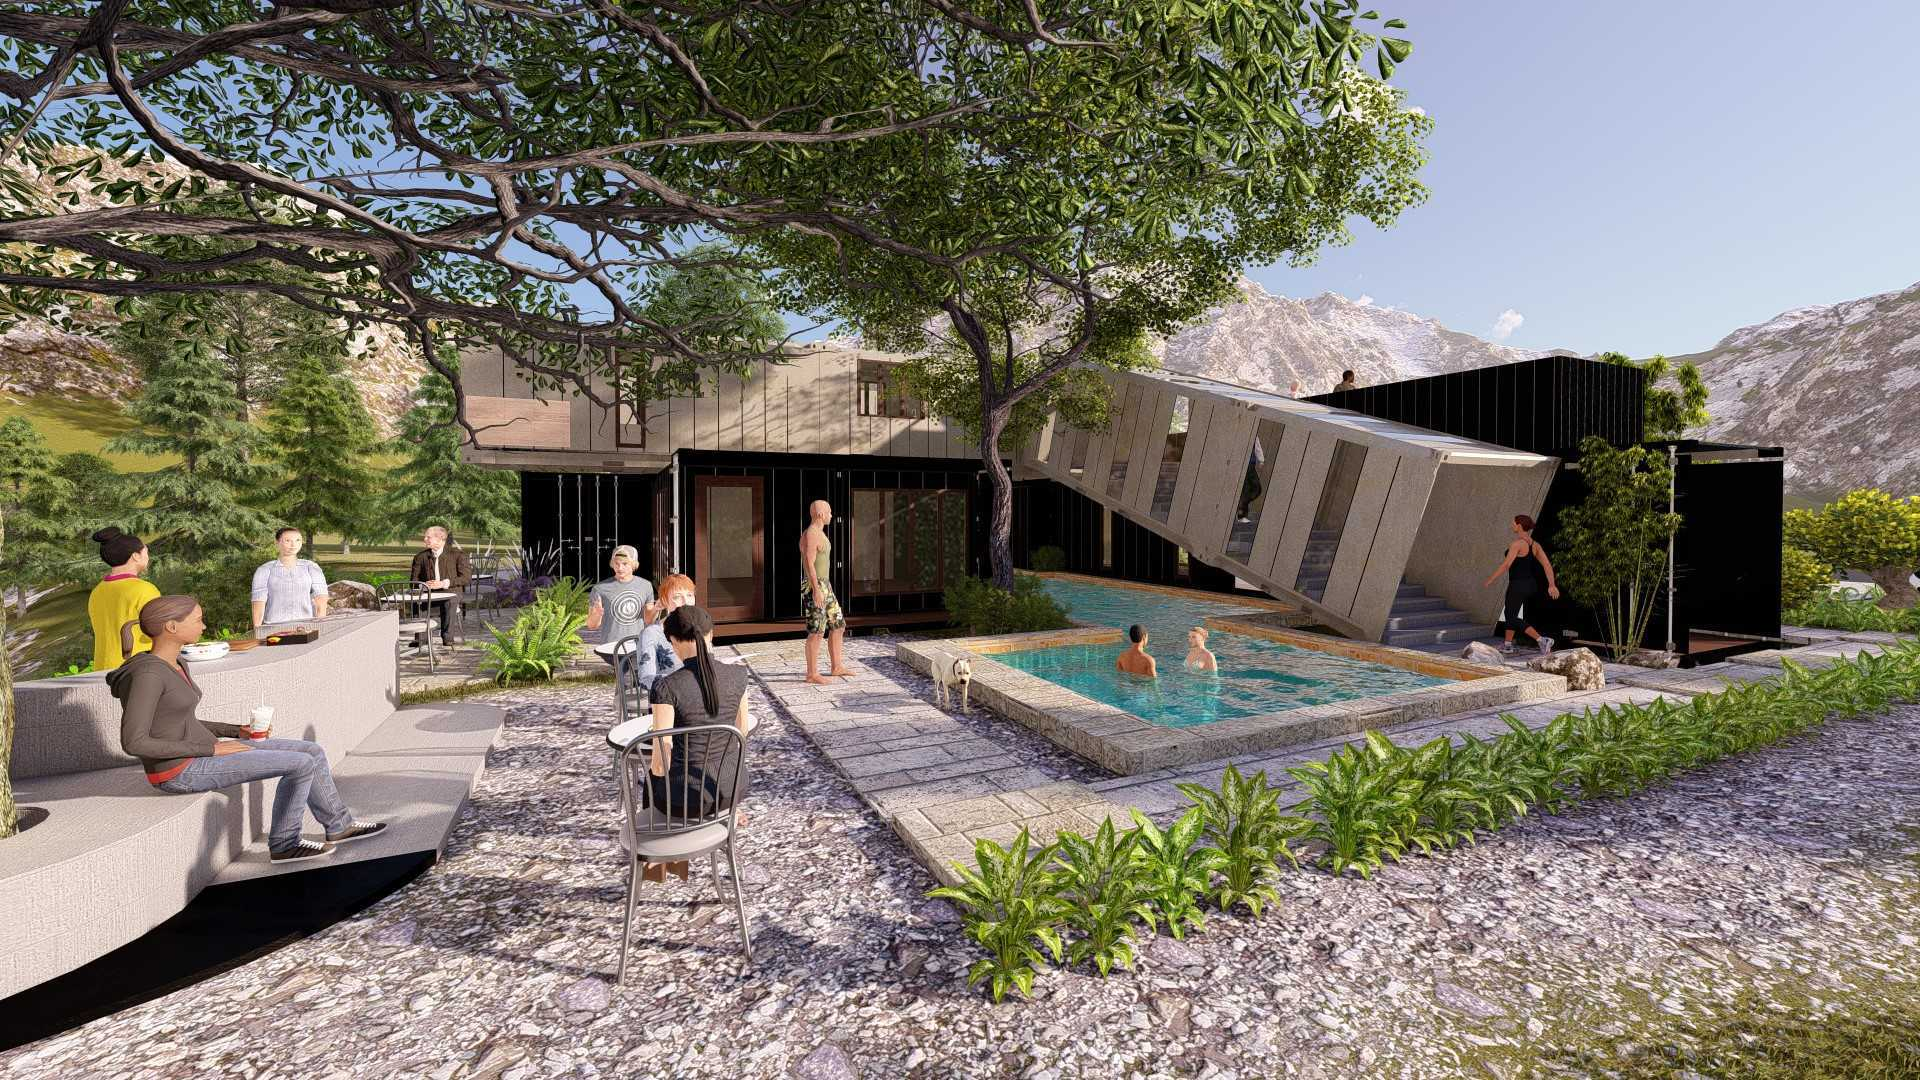 Rasi.o Arsitektur Studio Box2Box Container Villa Indonesia Indonesia Rasio-Arsitektur-Studio-Box2Box-Container-Villa   127551